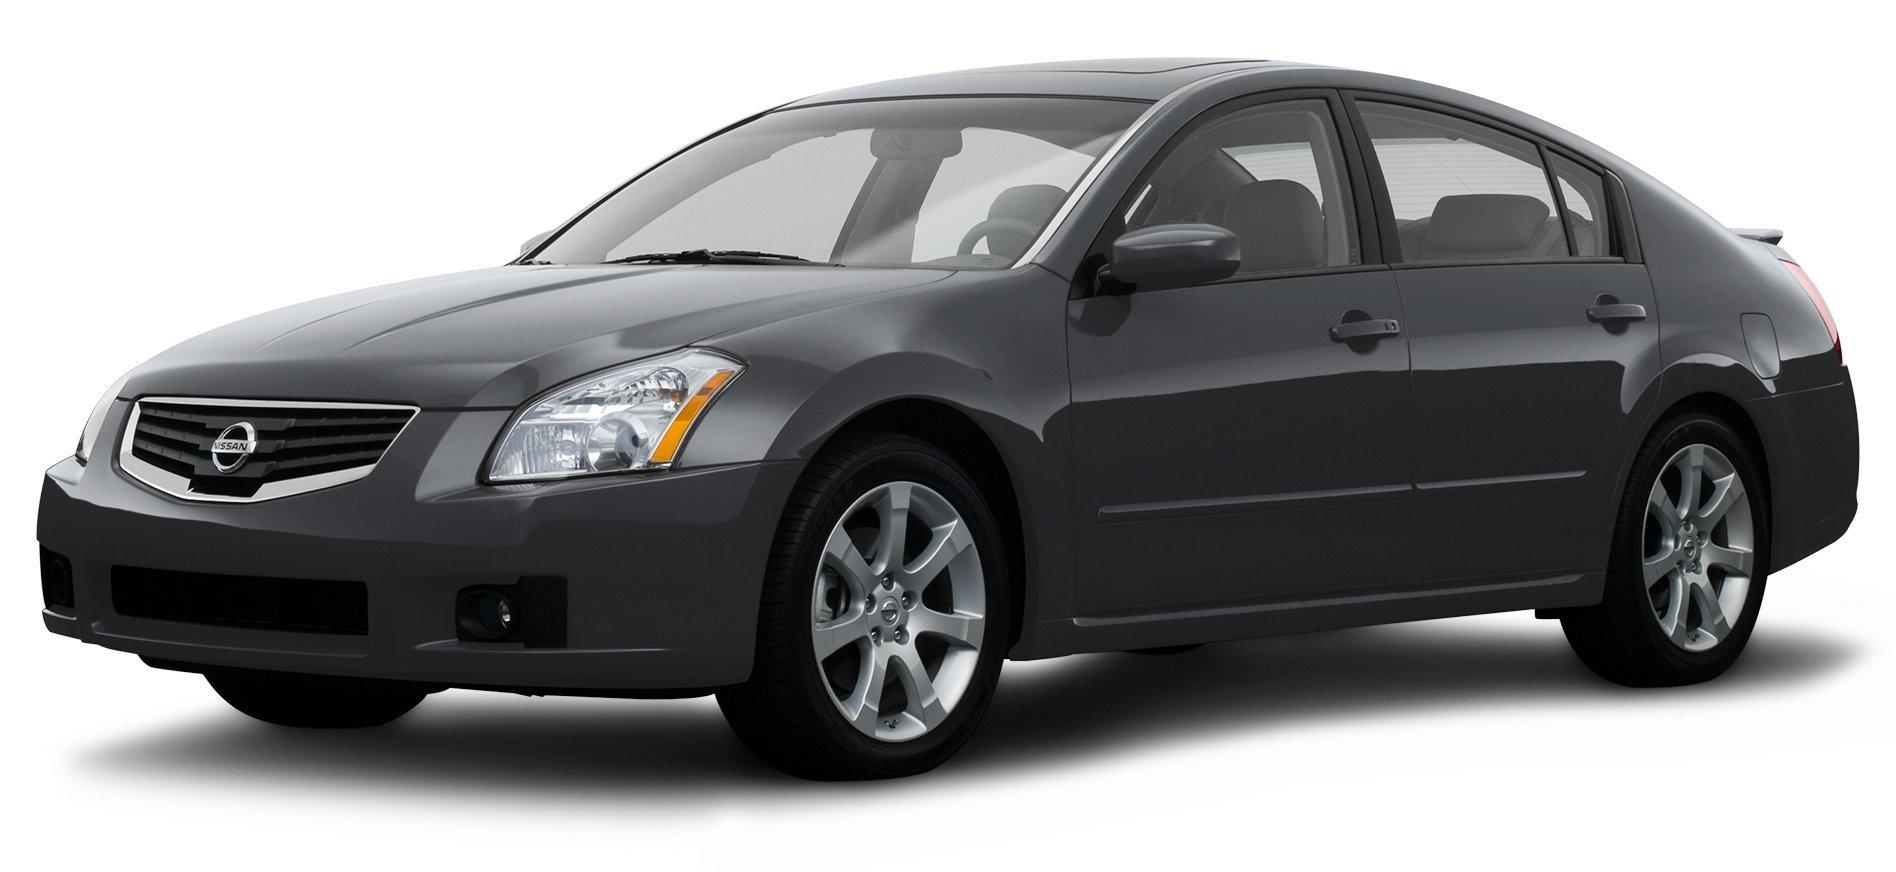 2008 Nissan Maxima 3.5 SE, 4 Door Sedan CVT ...